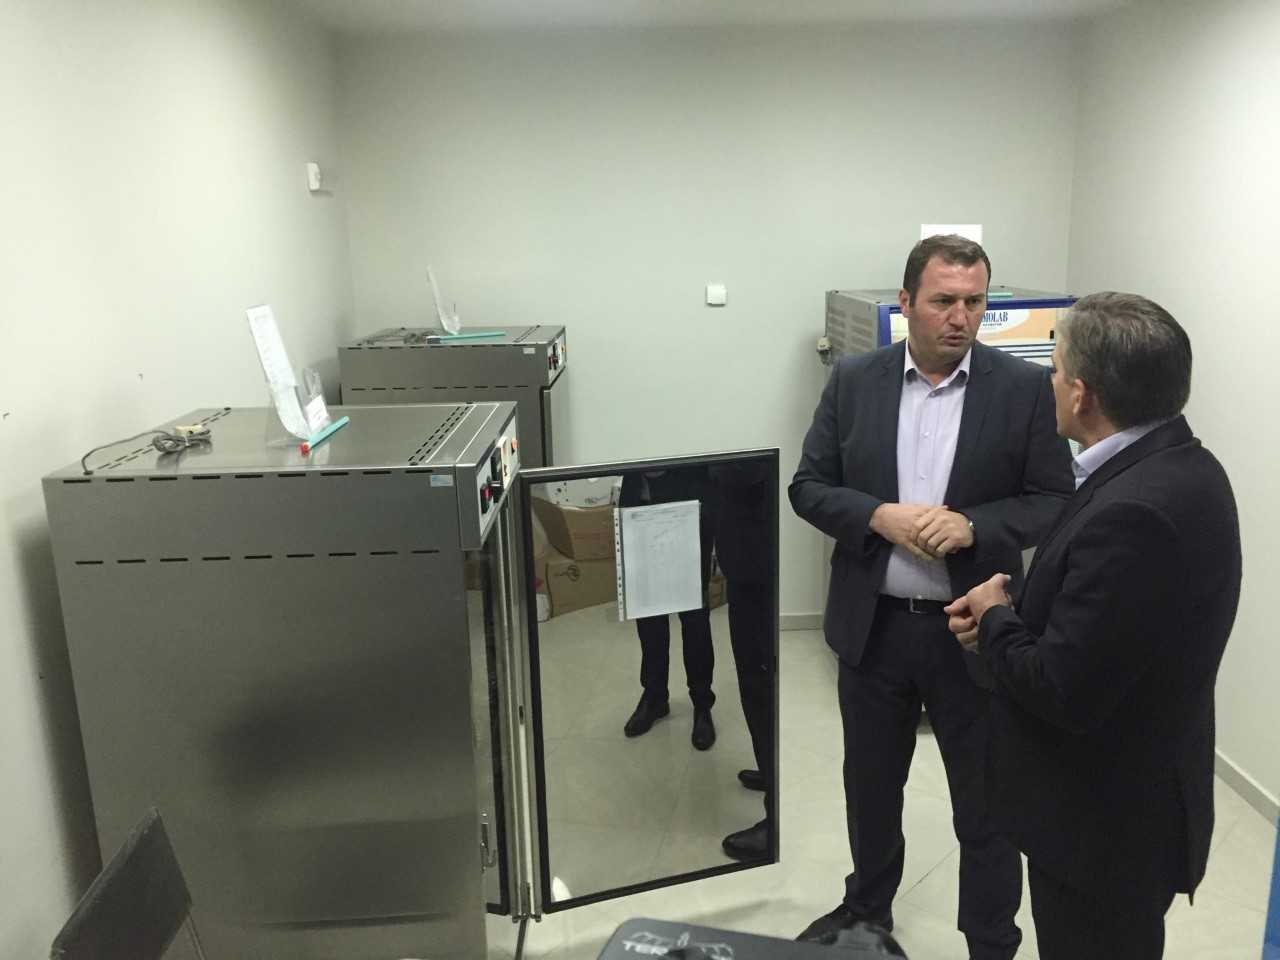 ministri-beqaj-kosoves-i-duhen-ndermarres-qe-nuk-prodhojne-vetem-per-tregun-e-brendshem